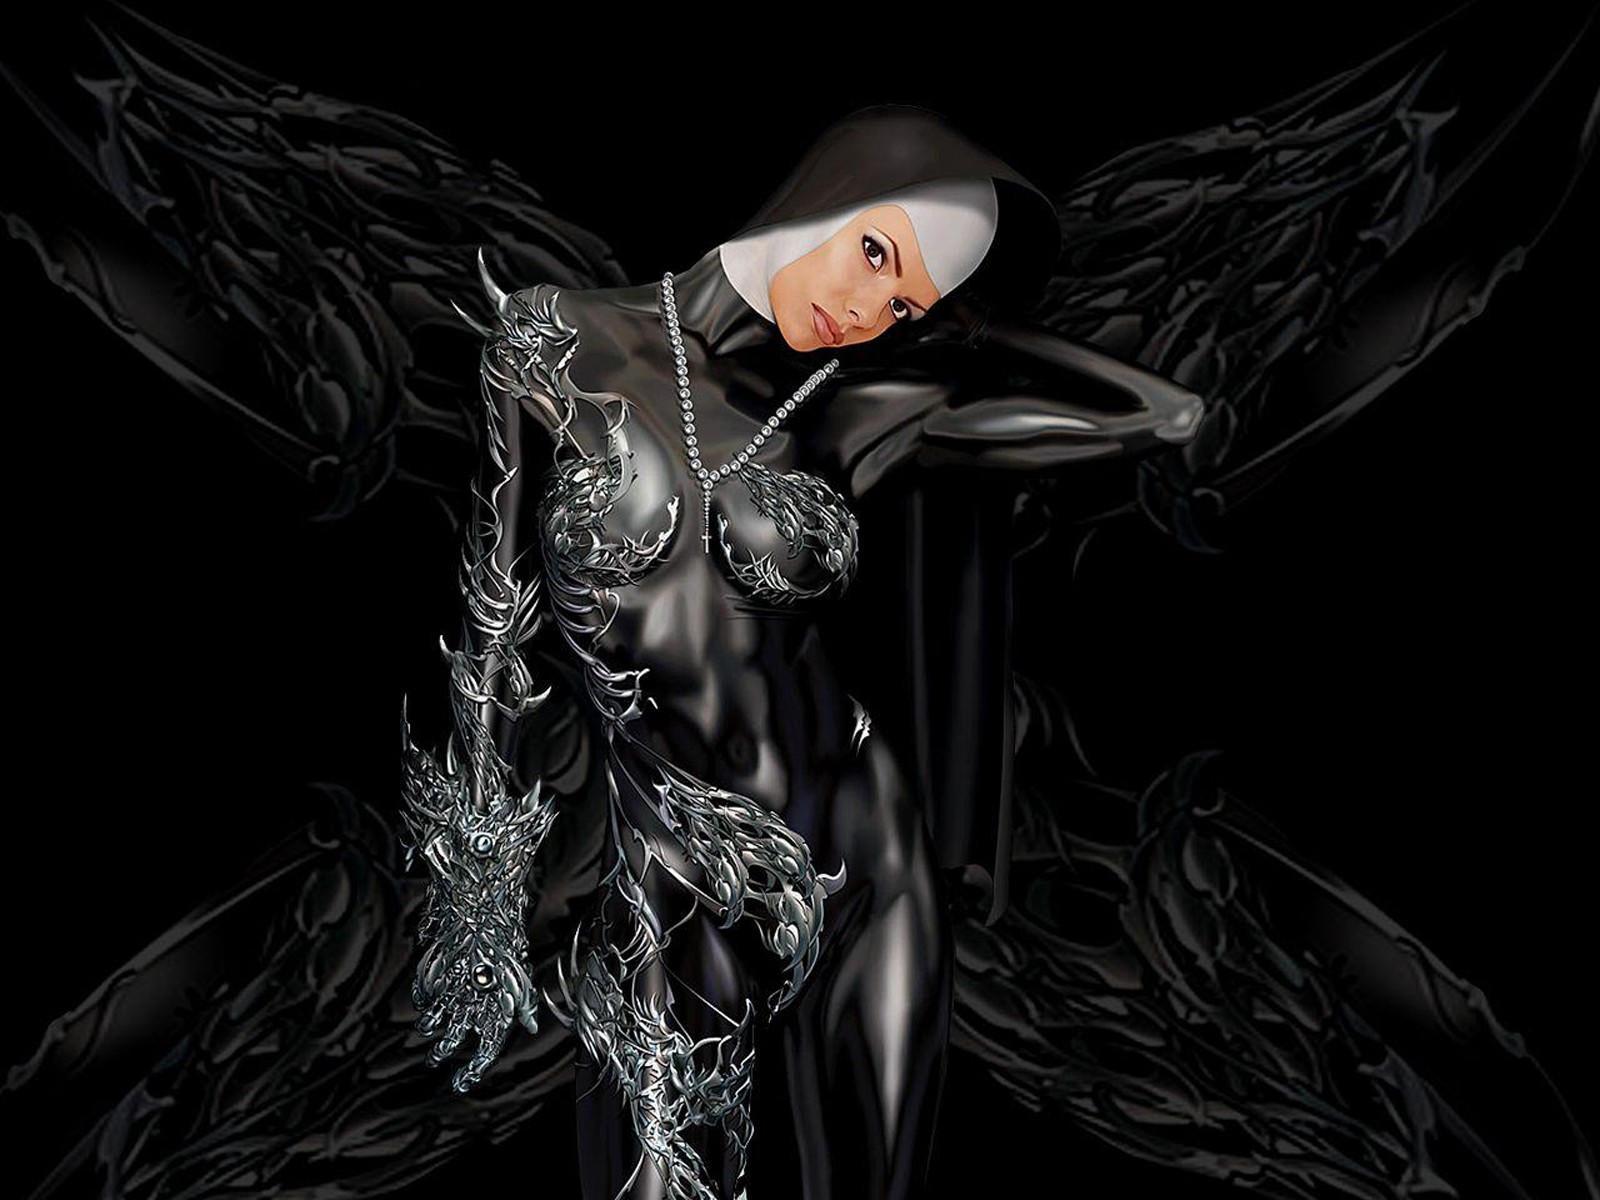 Черно белые фото монахини 18 фотография